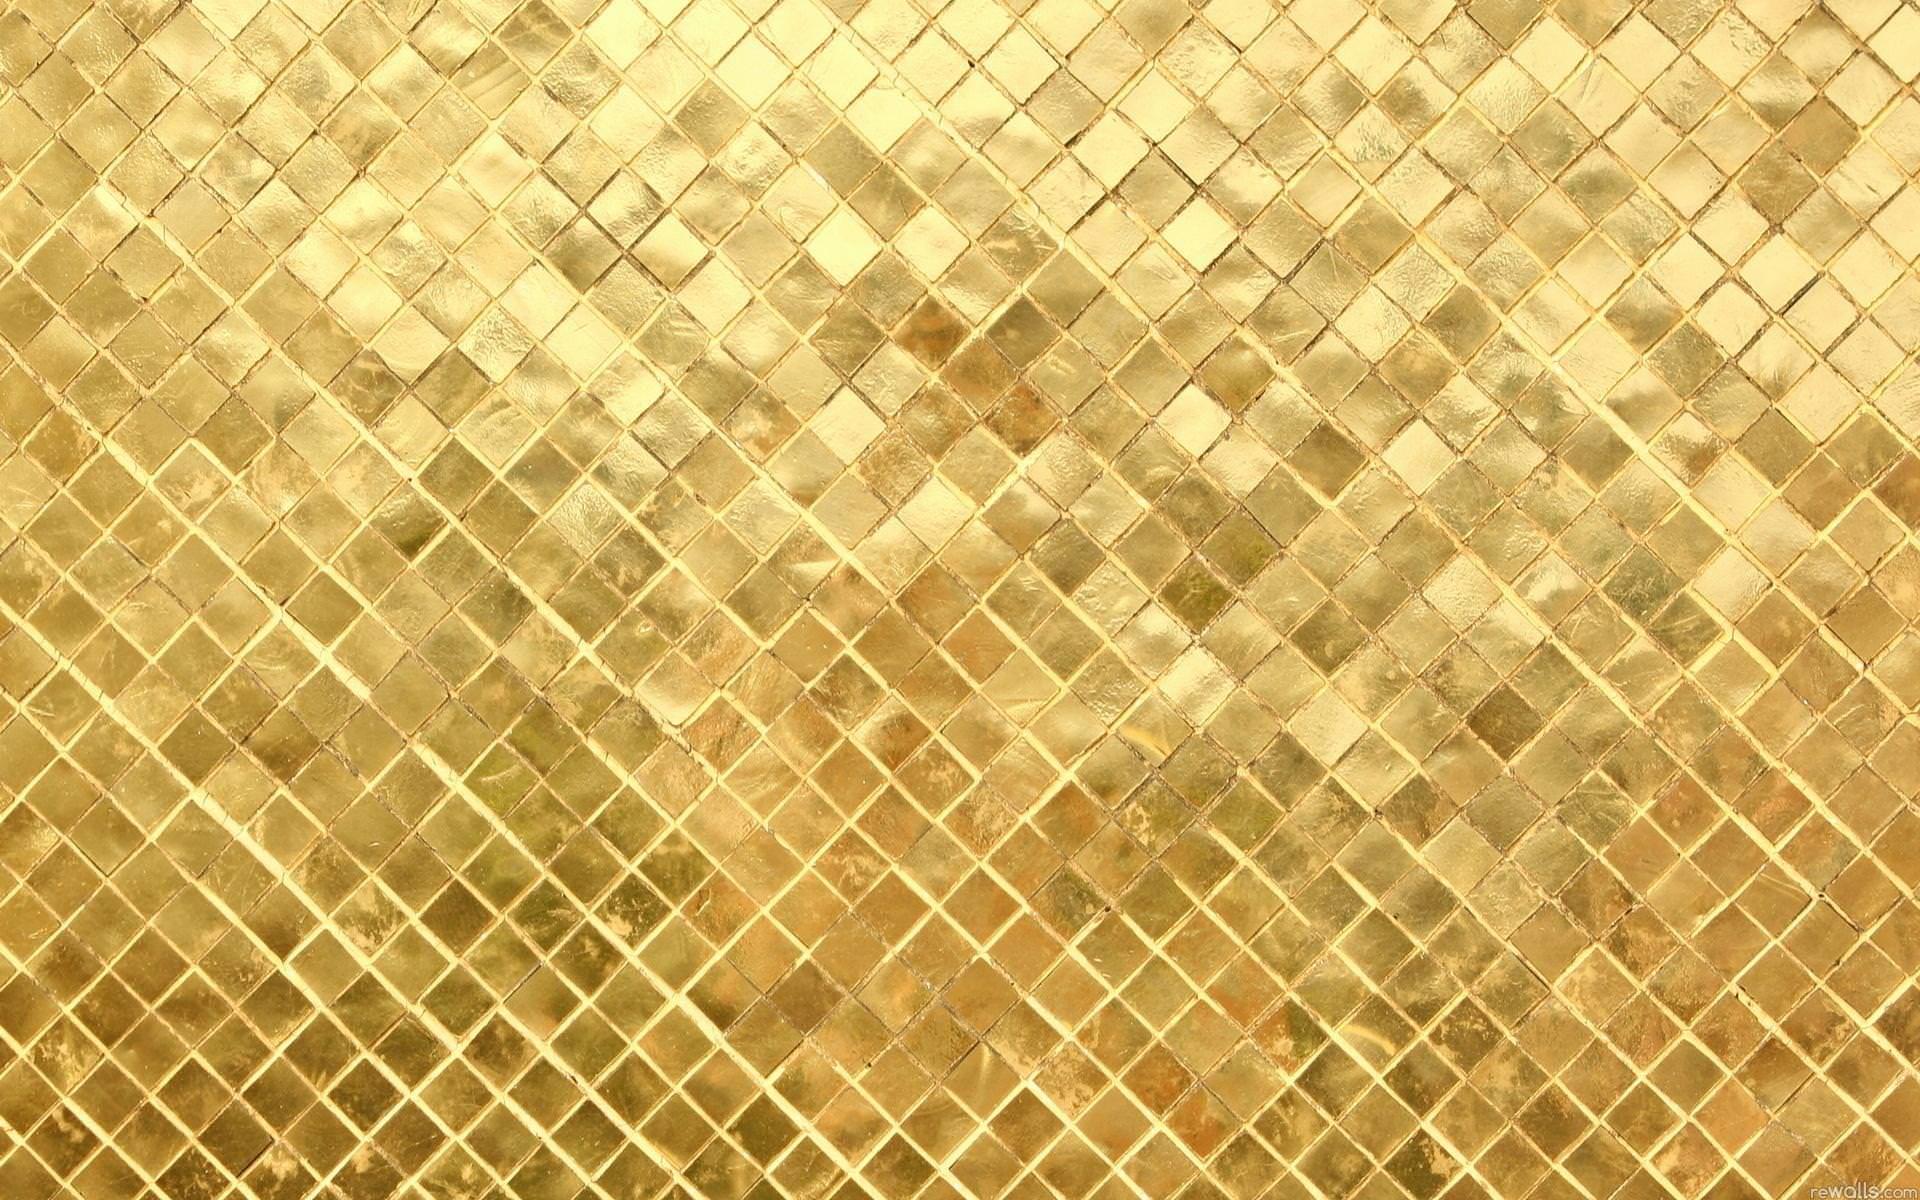 Pin By Lisa Burks On Powder Room Gold Glitter Wallpaper Hd